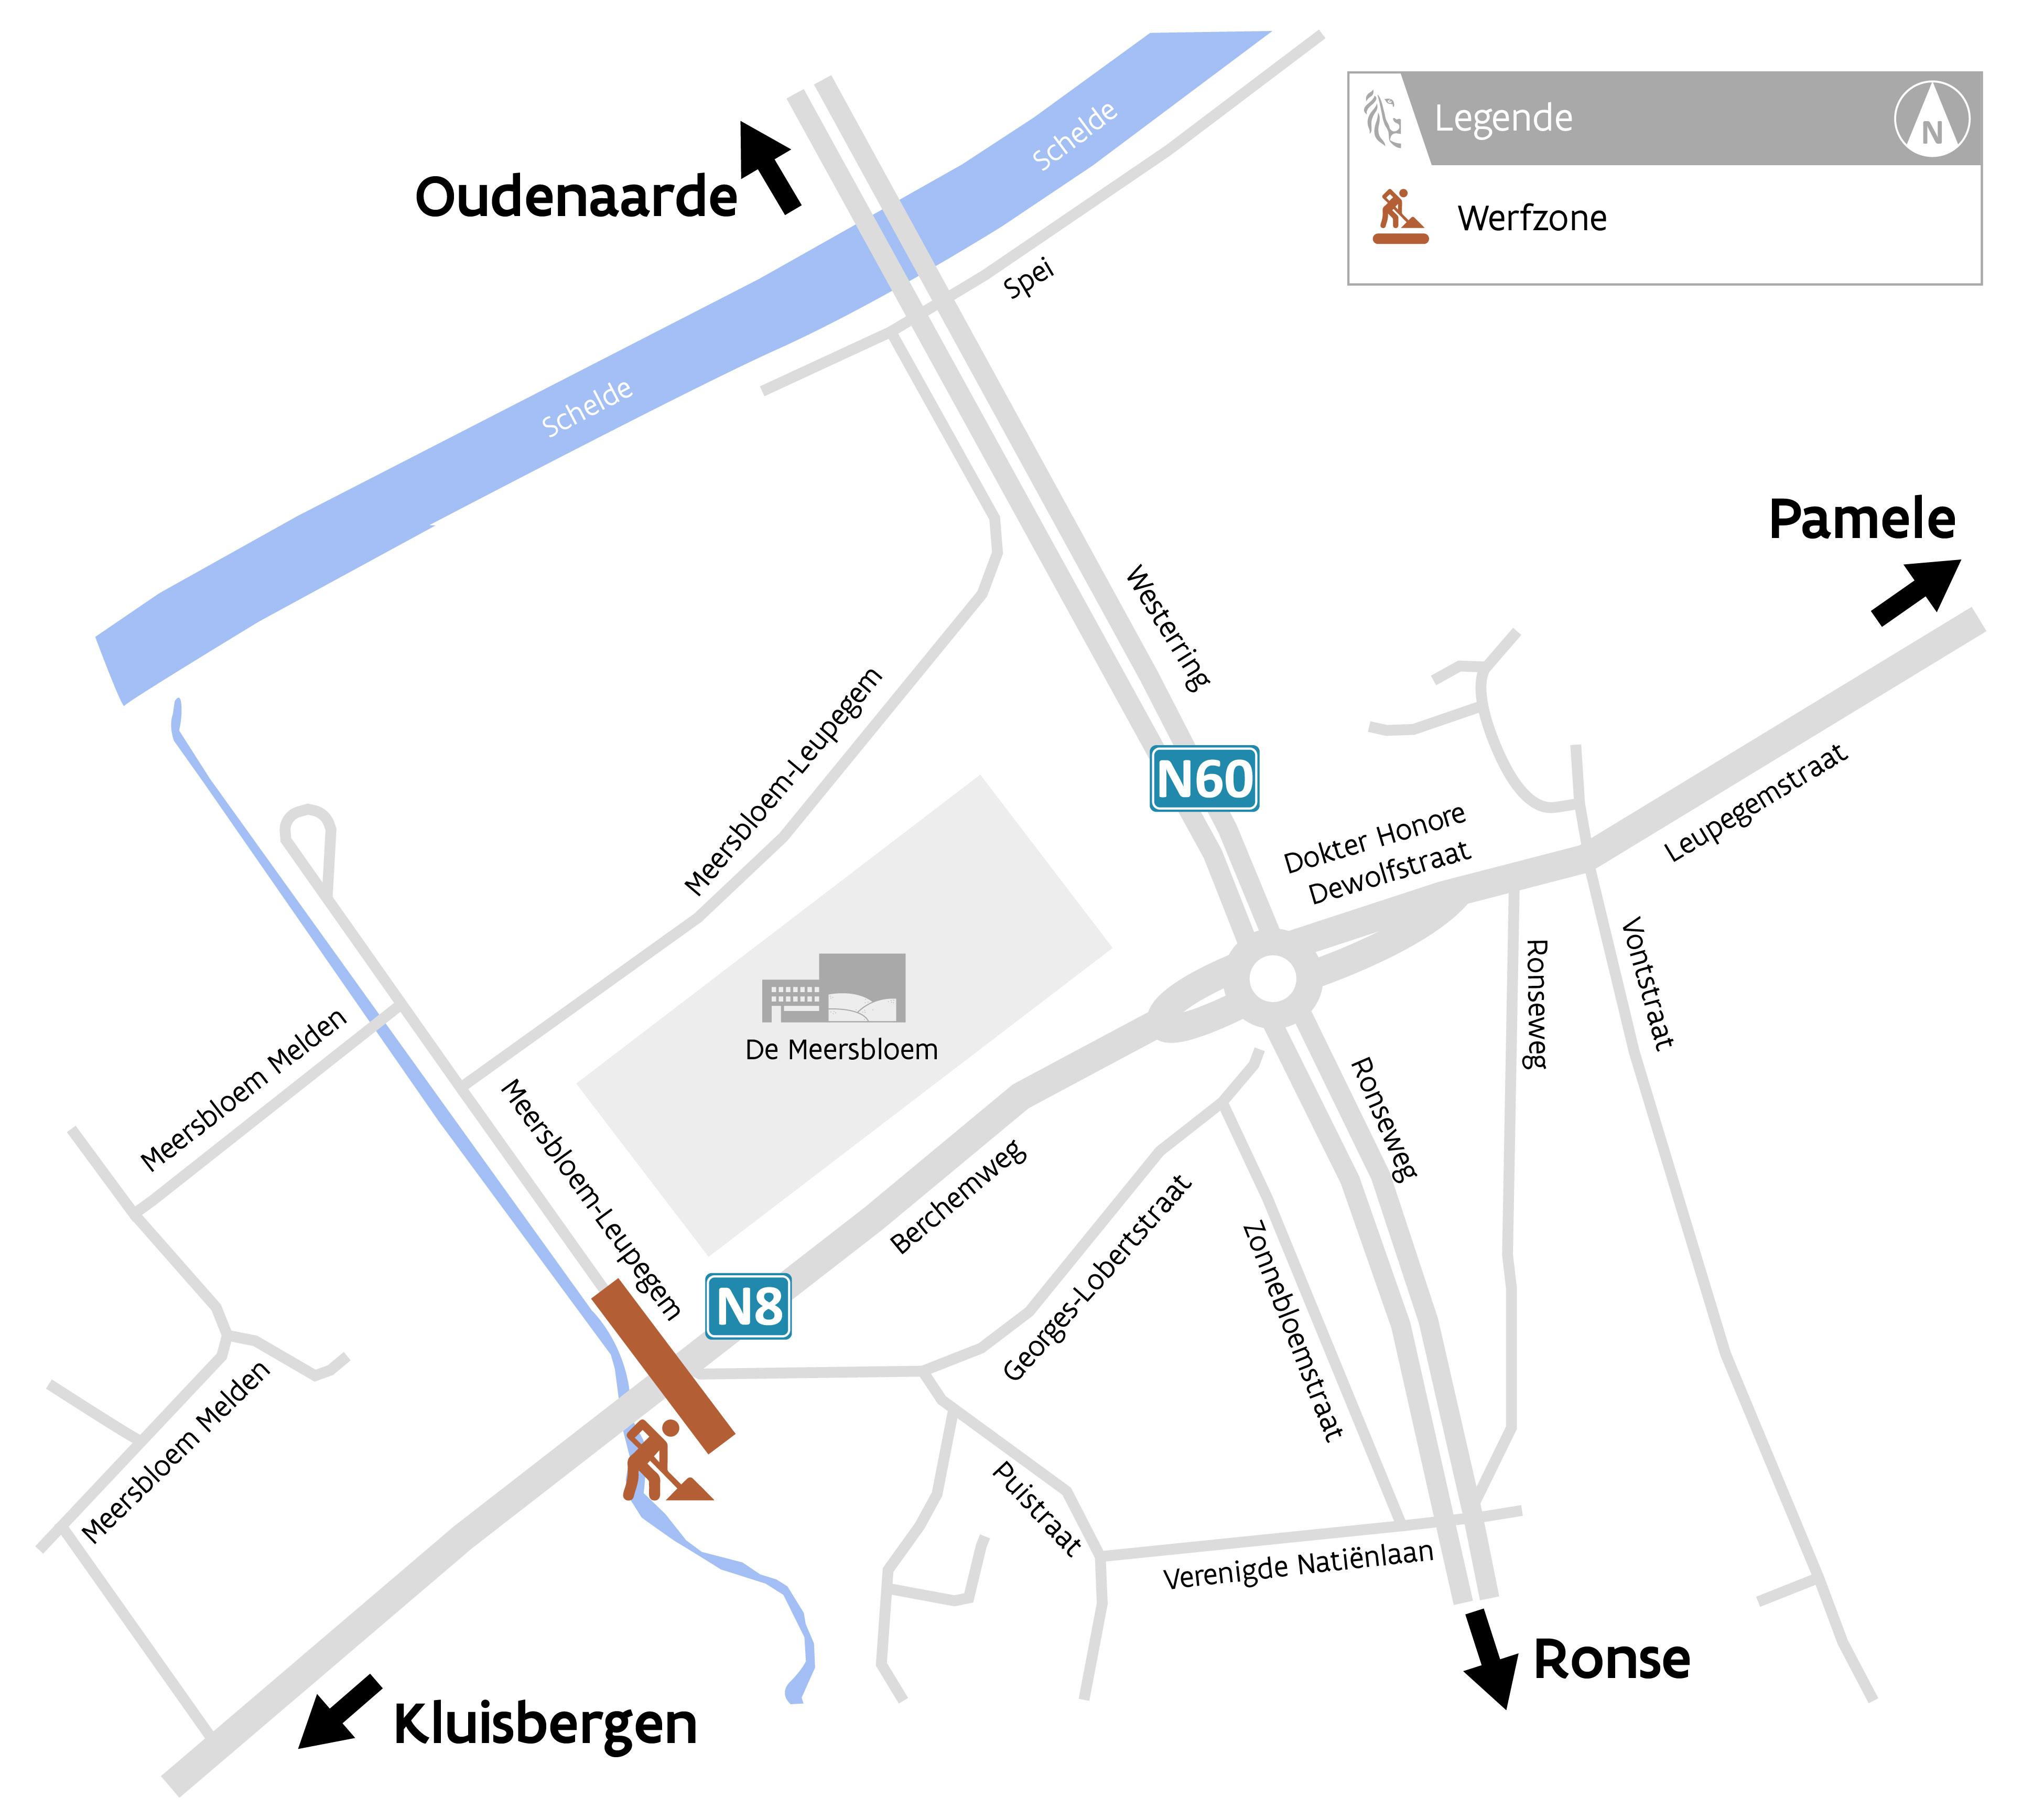 WOV Maarkebeek Oudenaarde overzichtskaartje